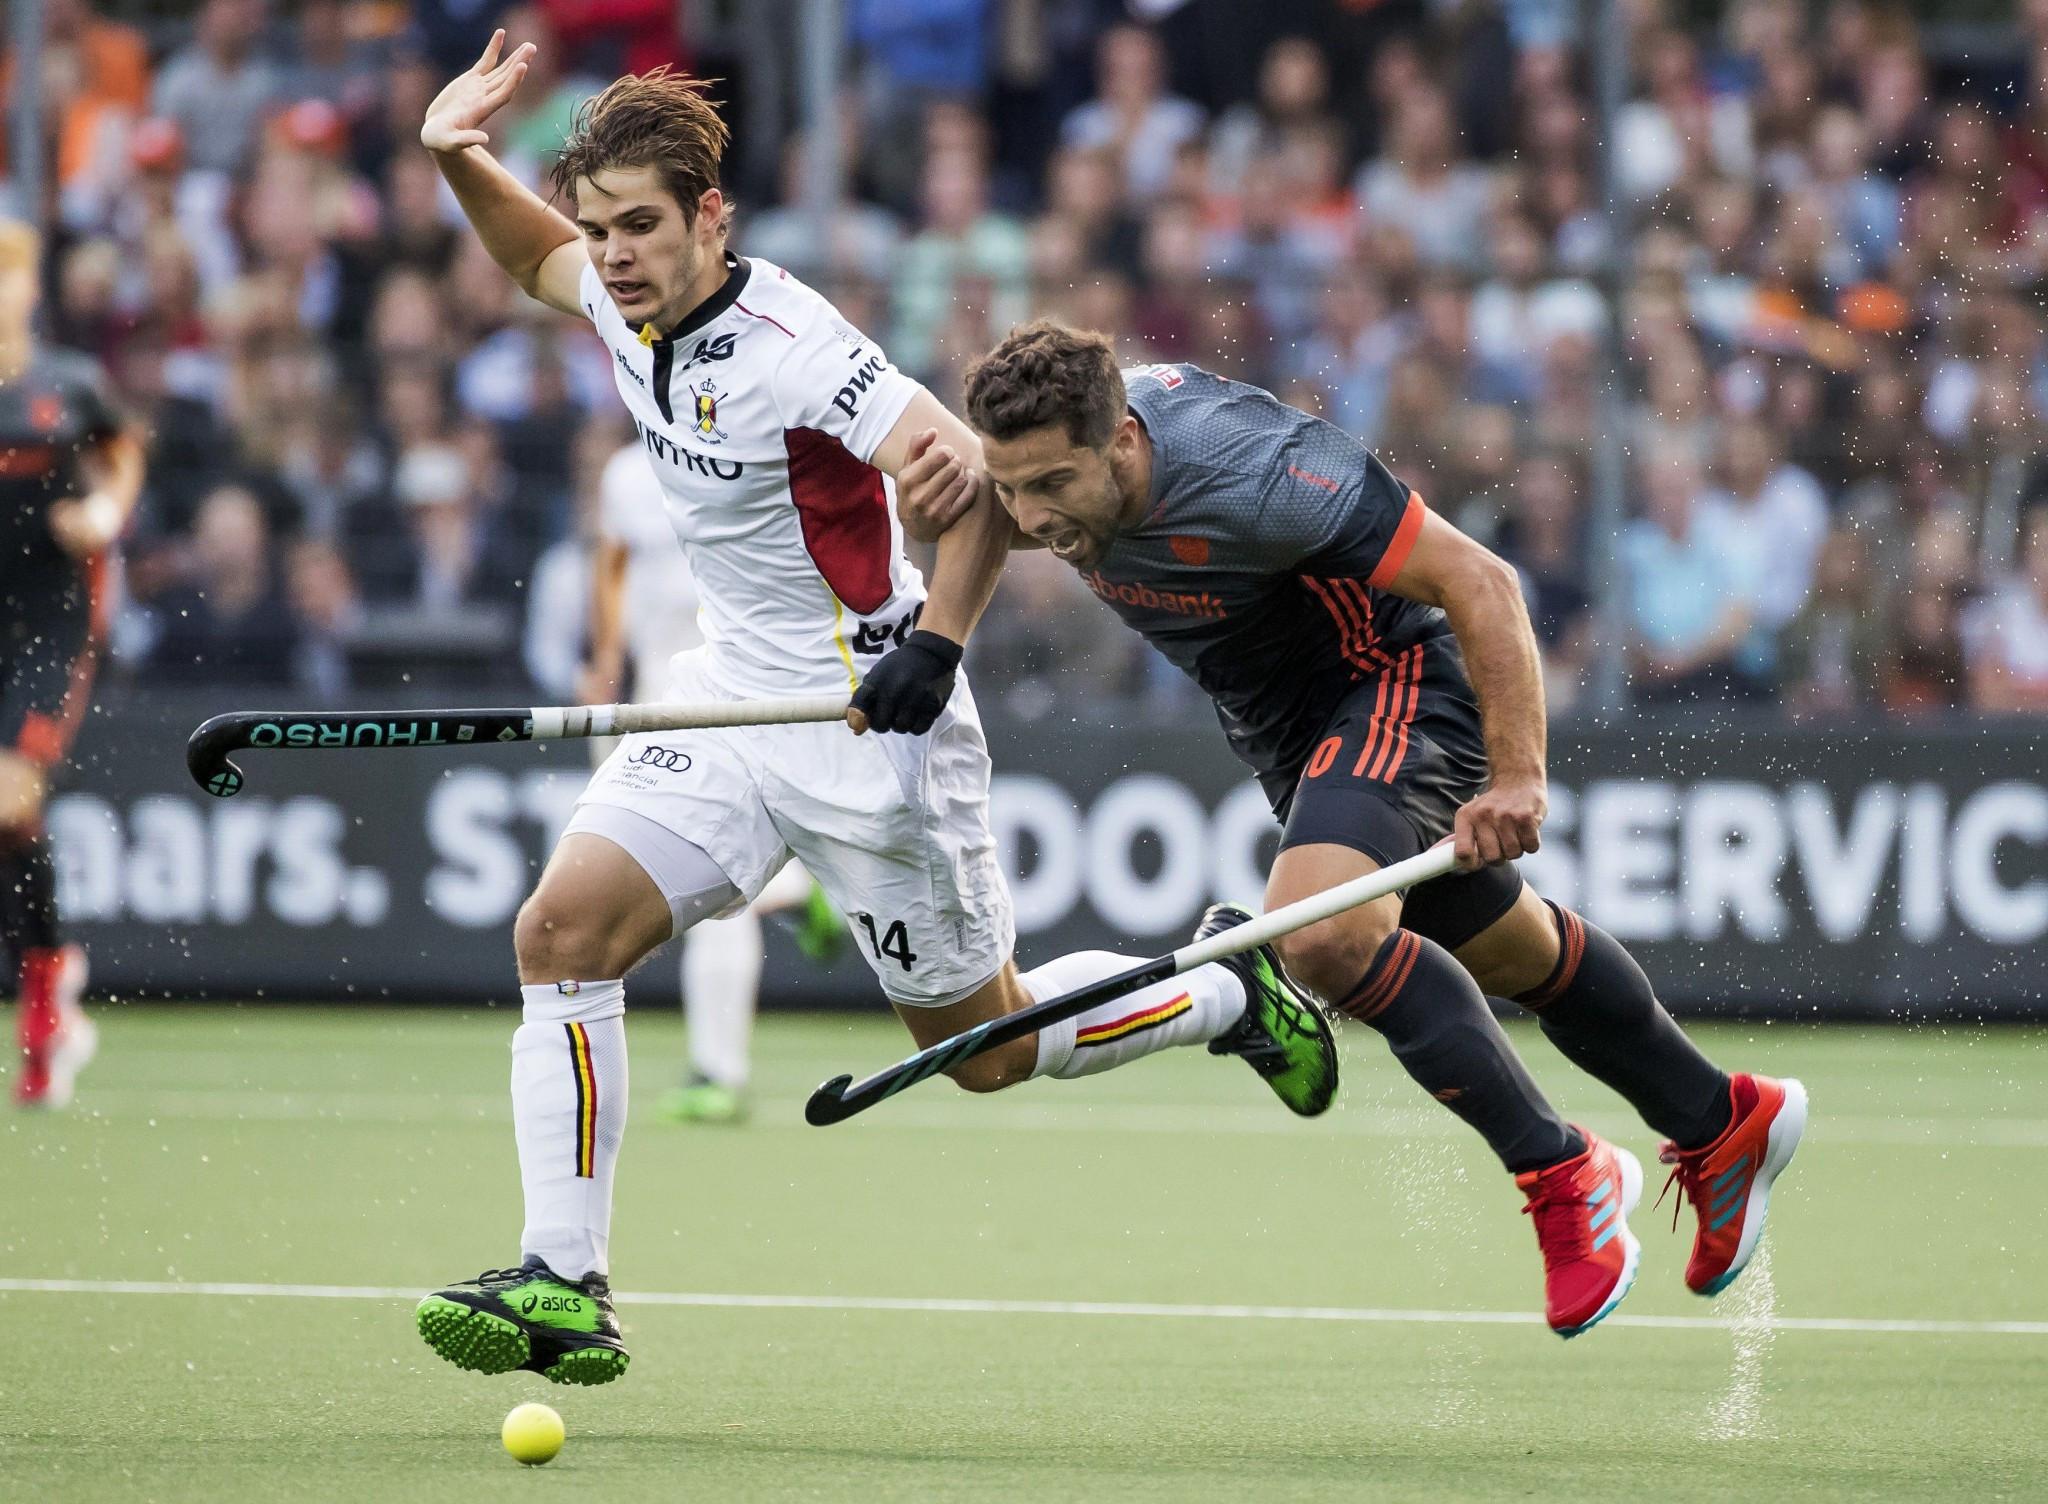 Belgium thrash hosts at EuroHockey Championships